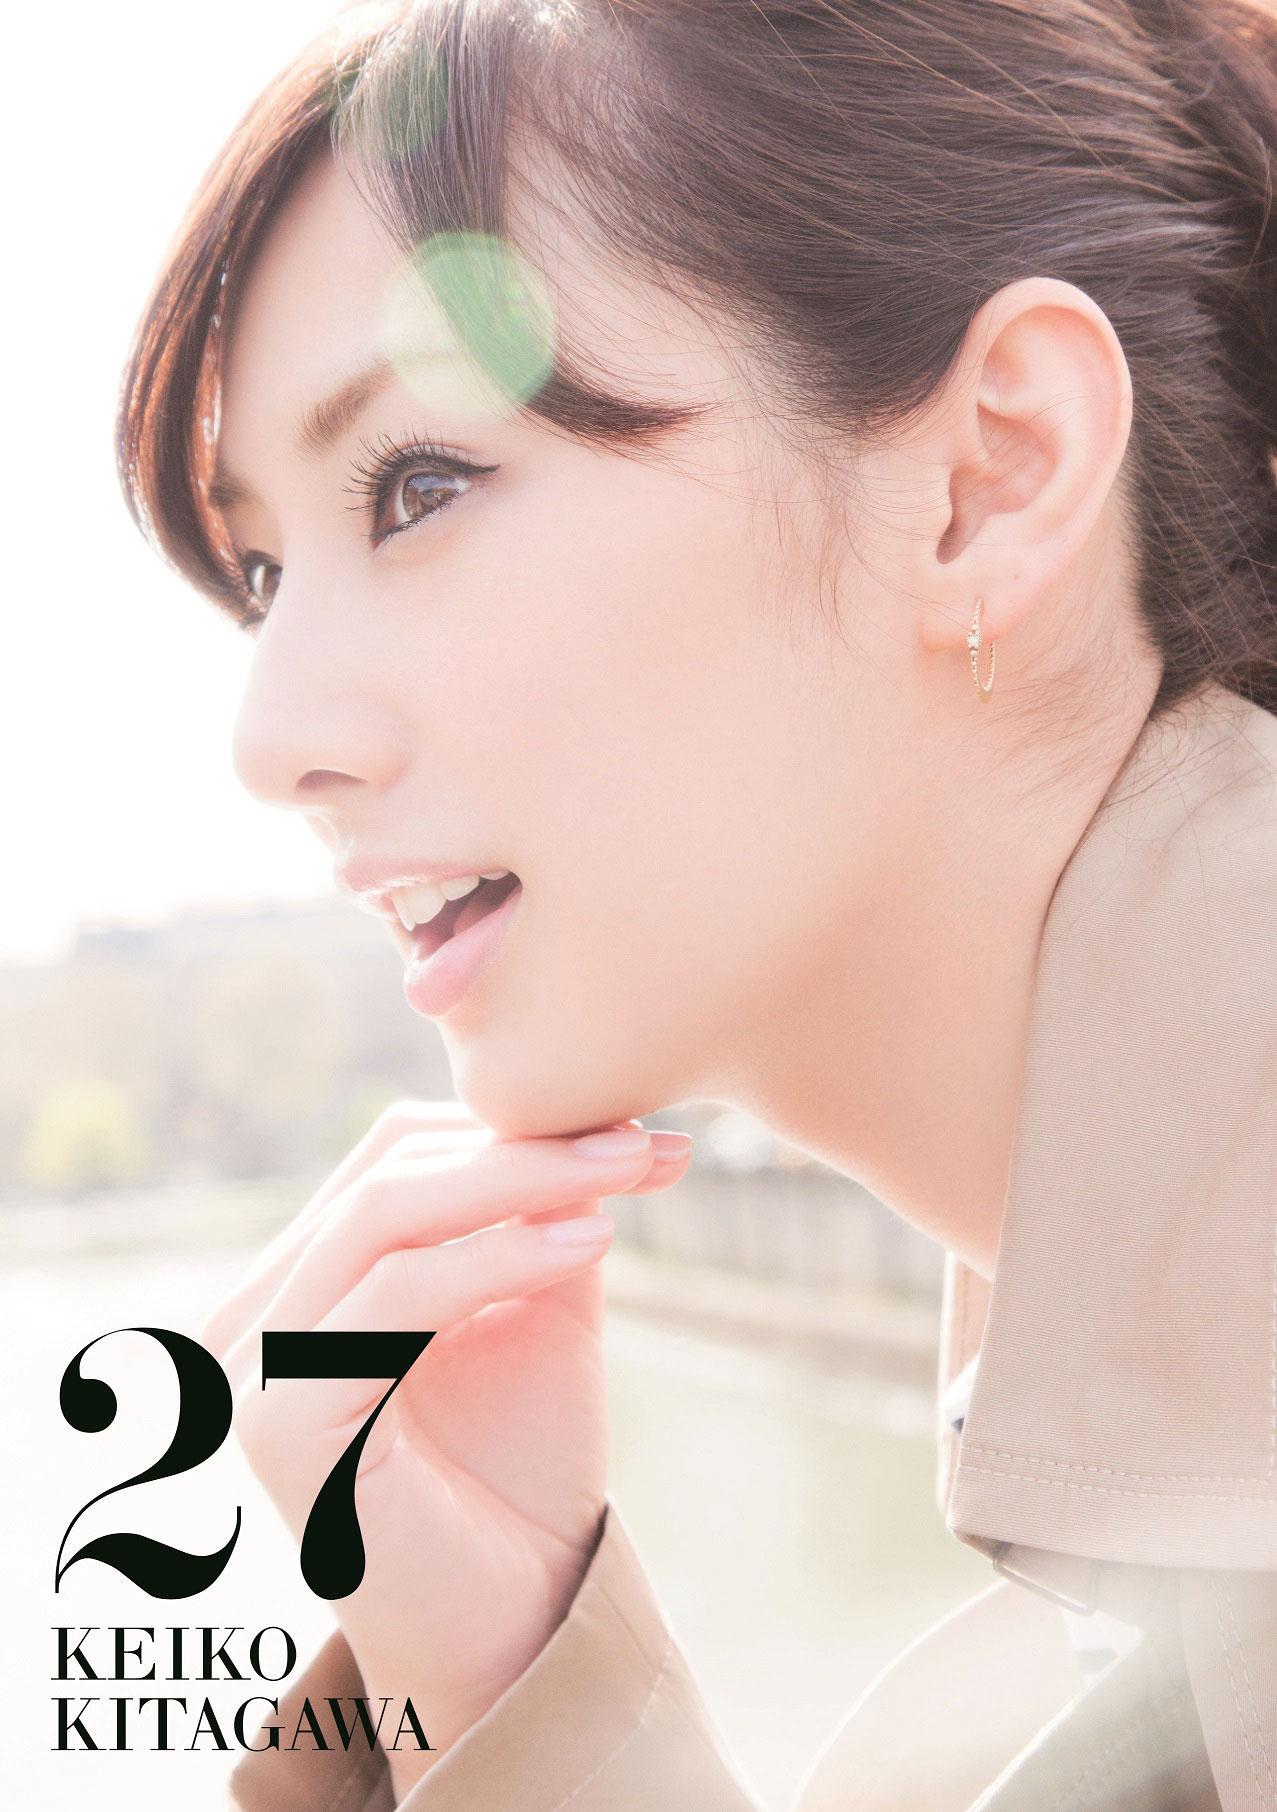 Japanese actress Keiko Kitagawa 27 photobook